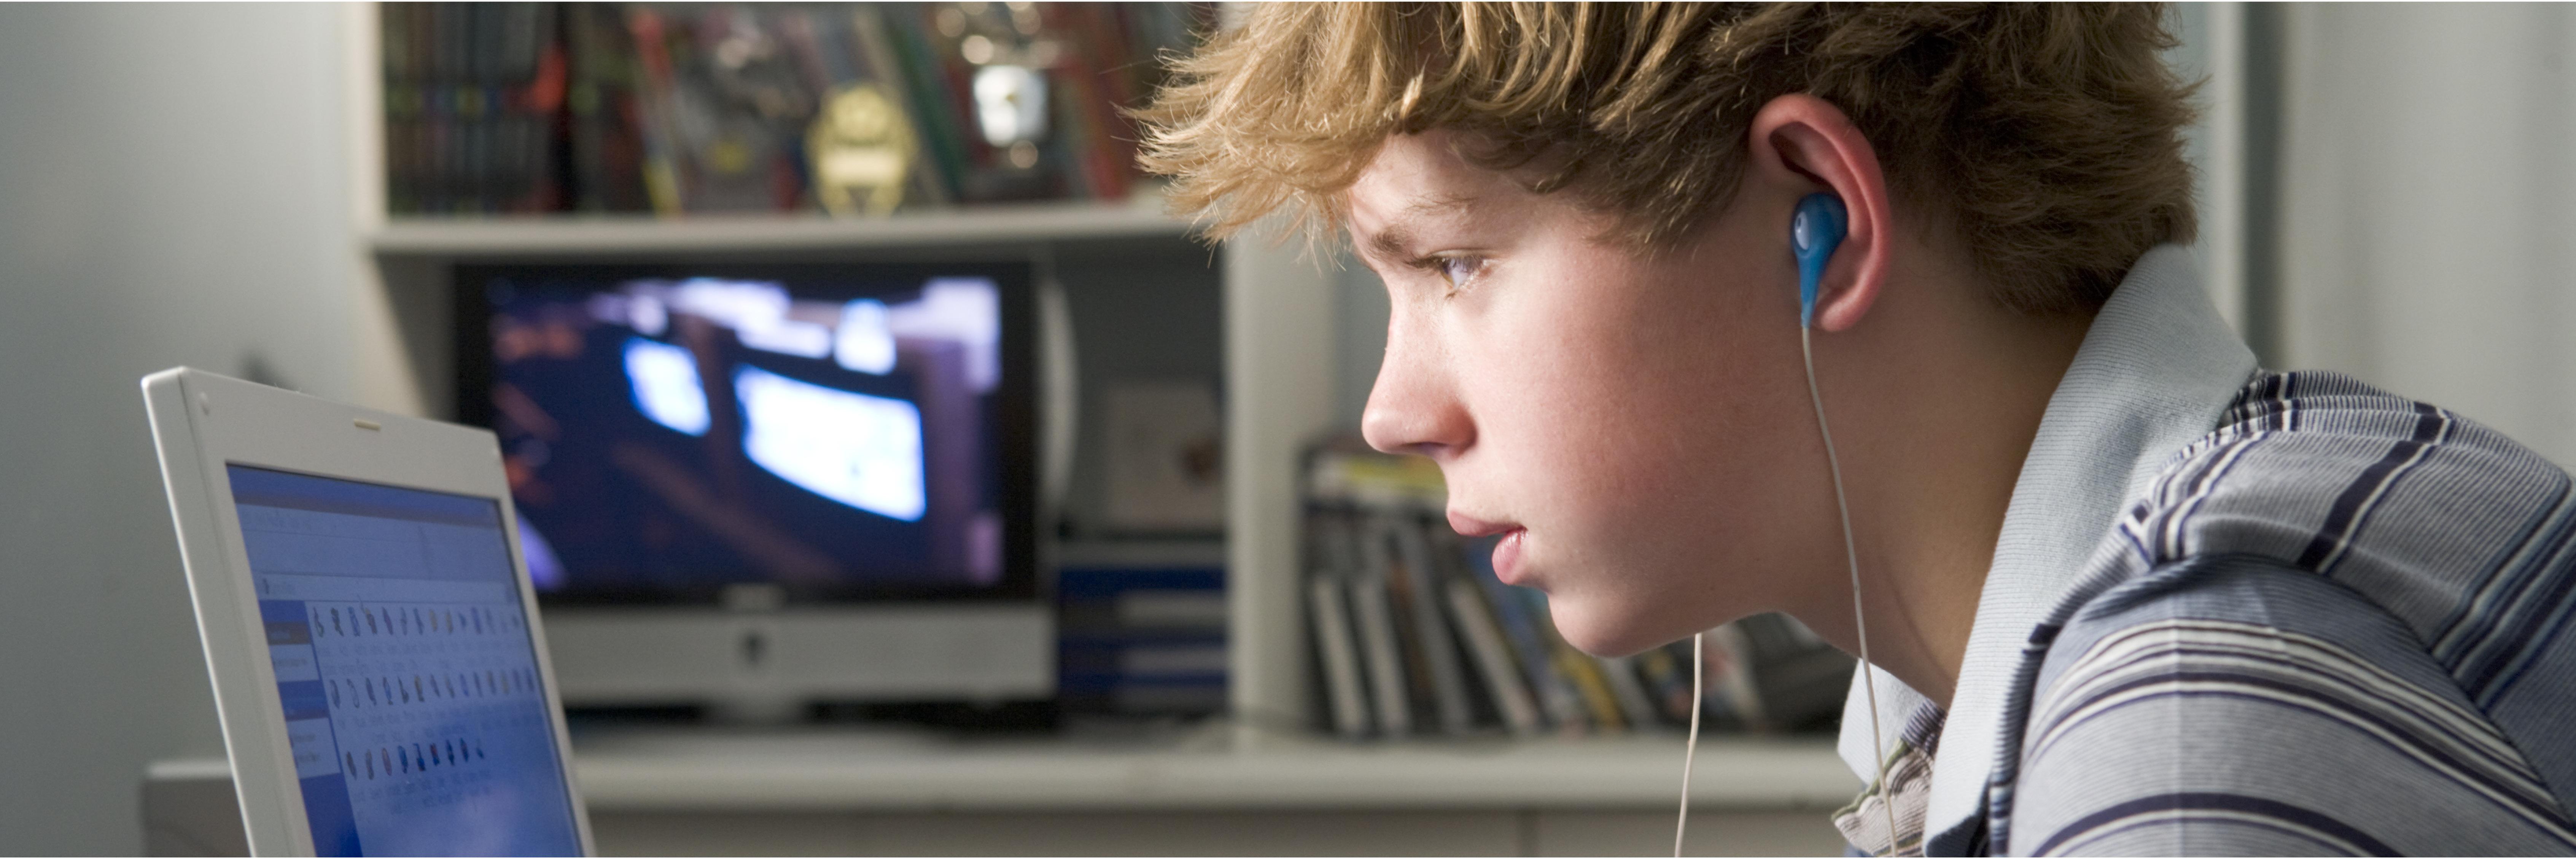 Boy-General Data Protection Regulation